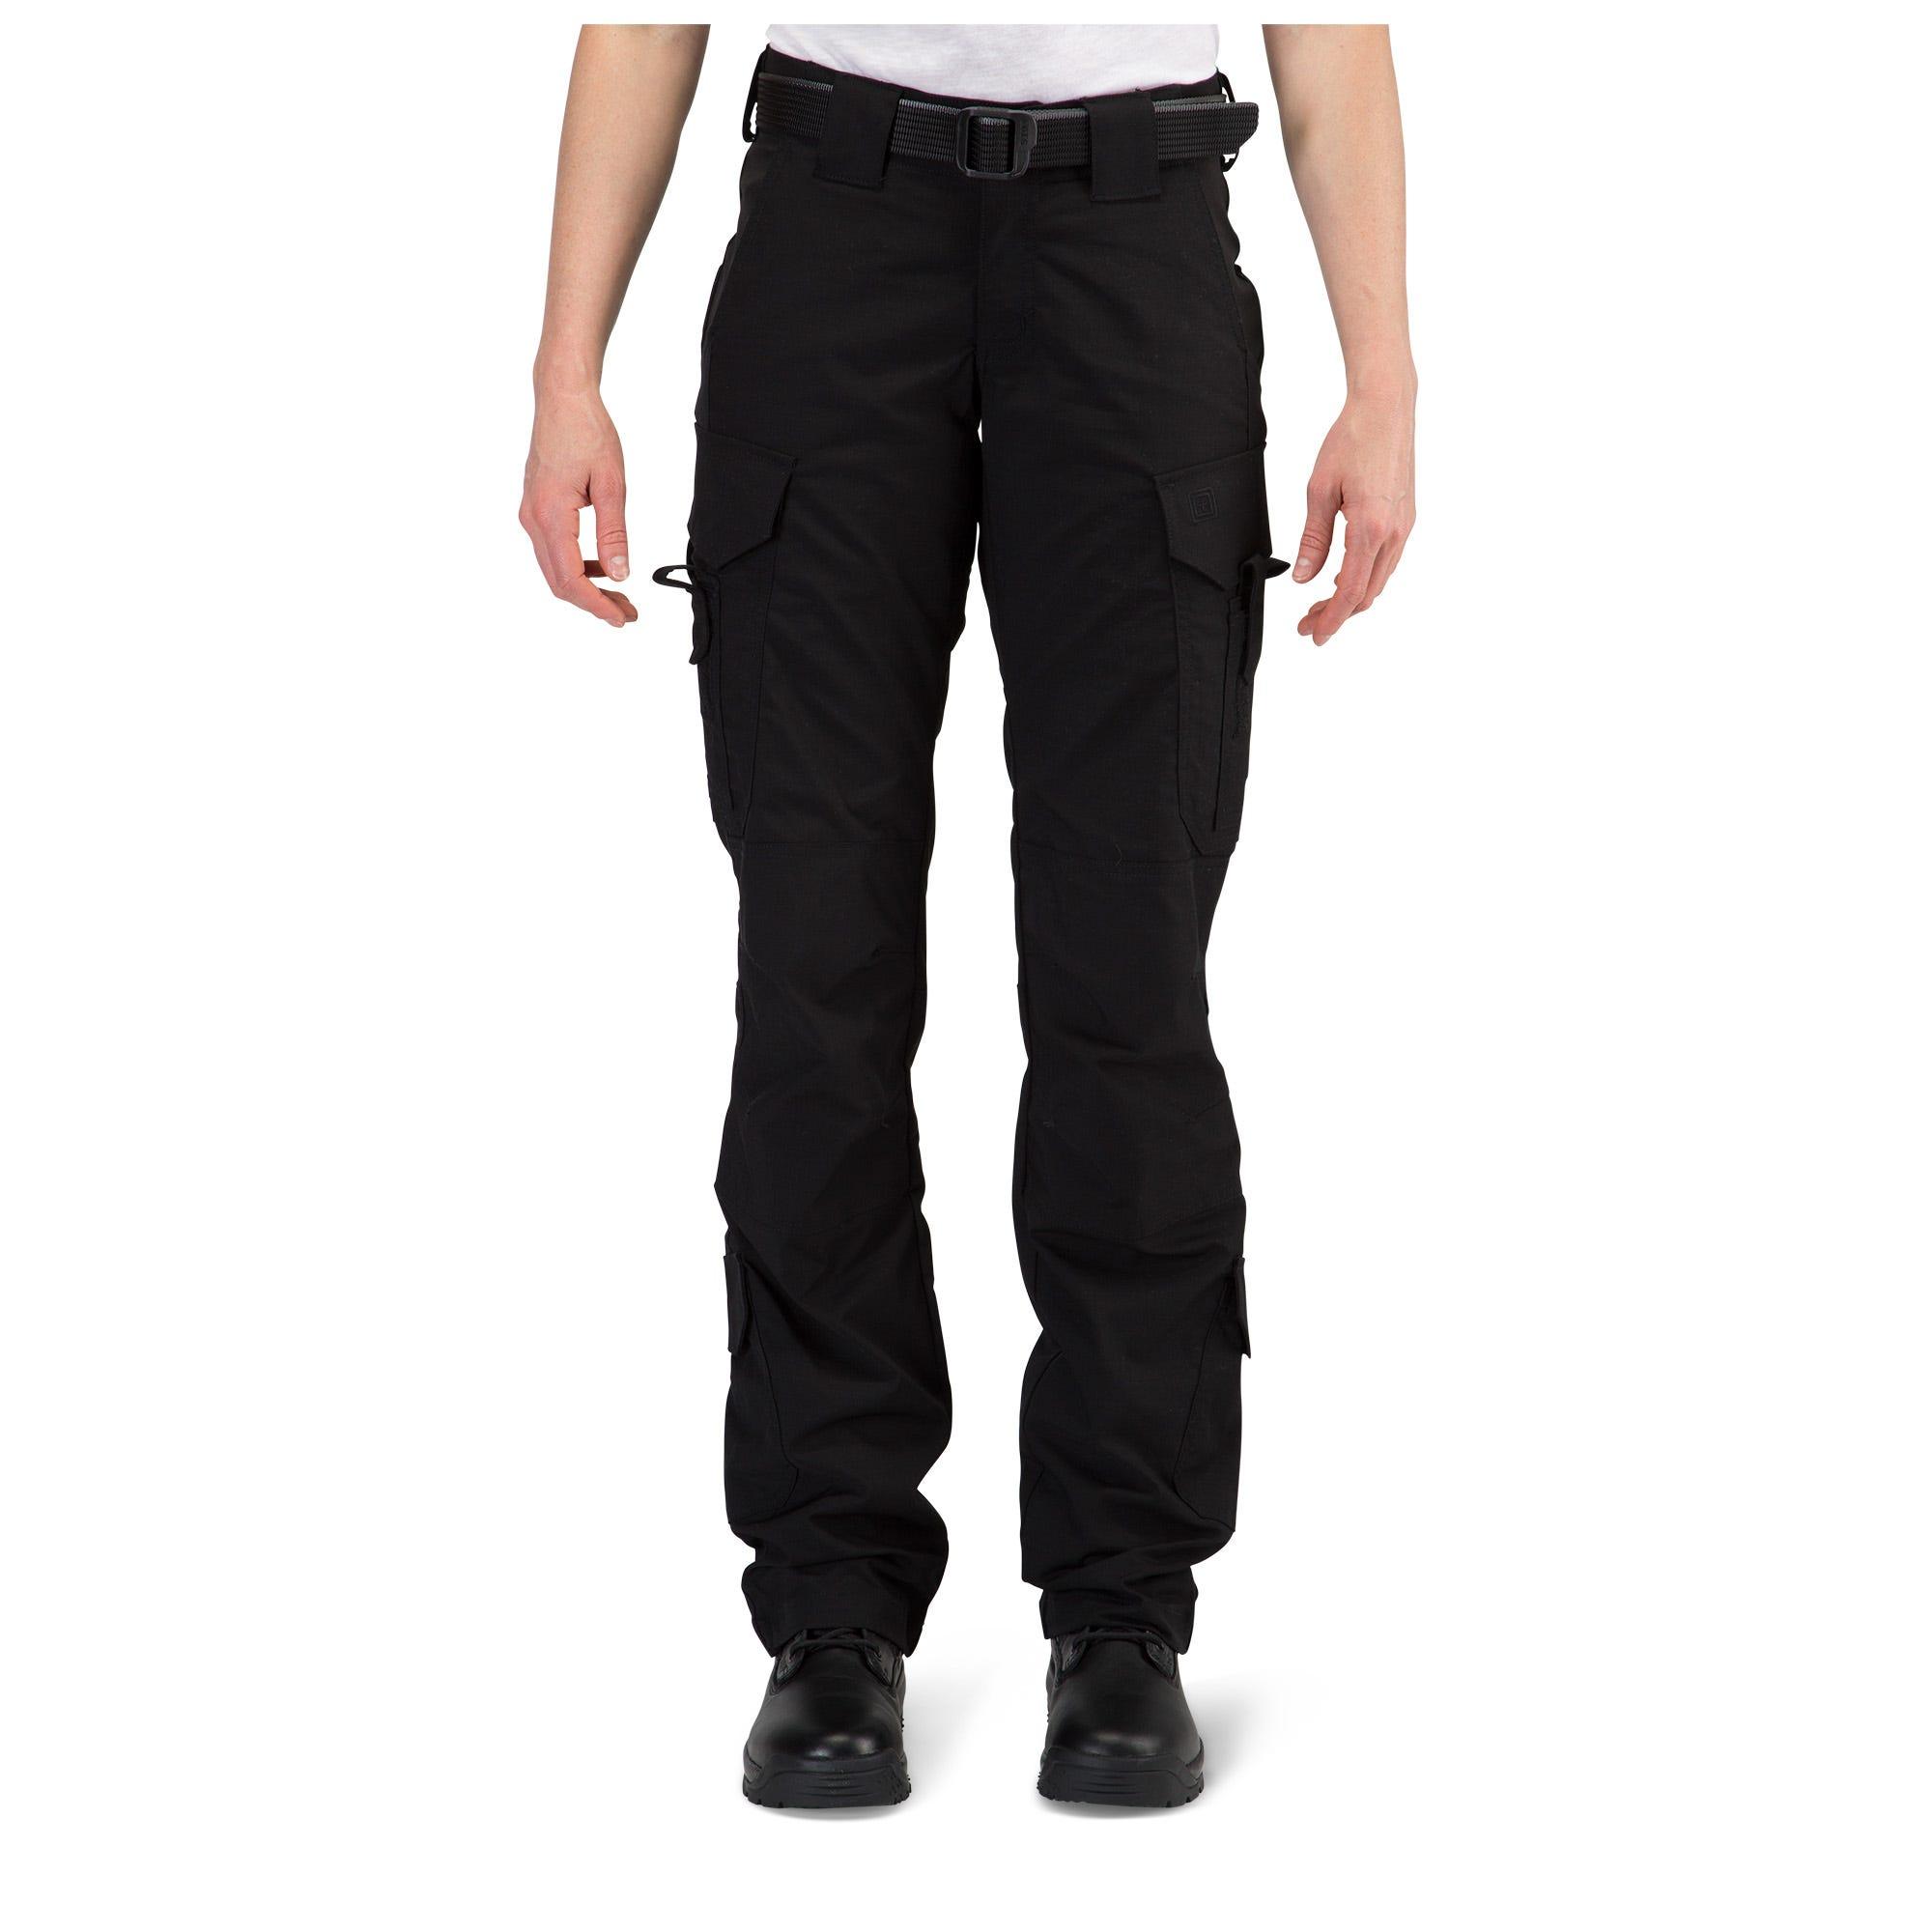 Women s EMS Uniform Pants - 5.11 Tactical 1eb0d7cfe